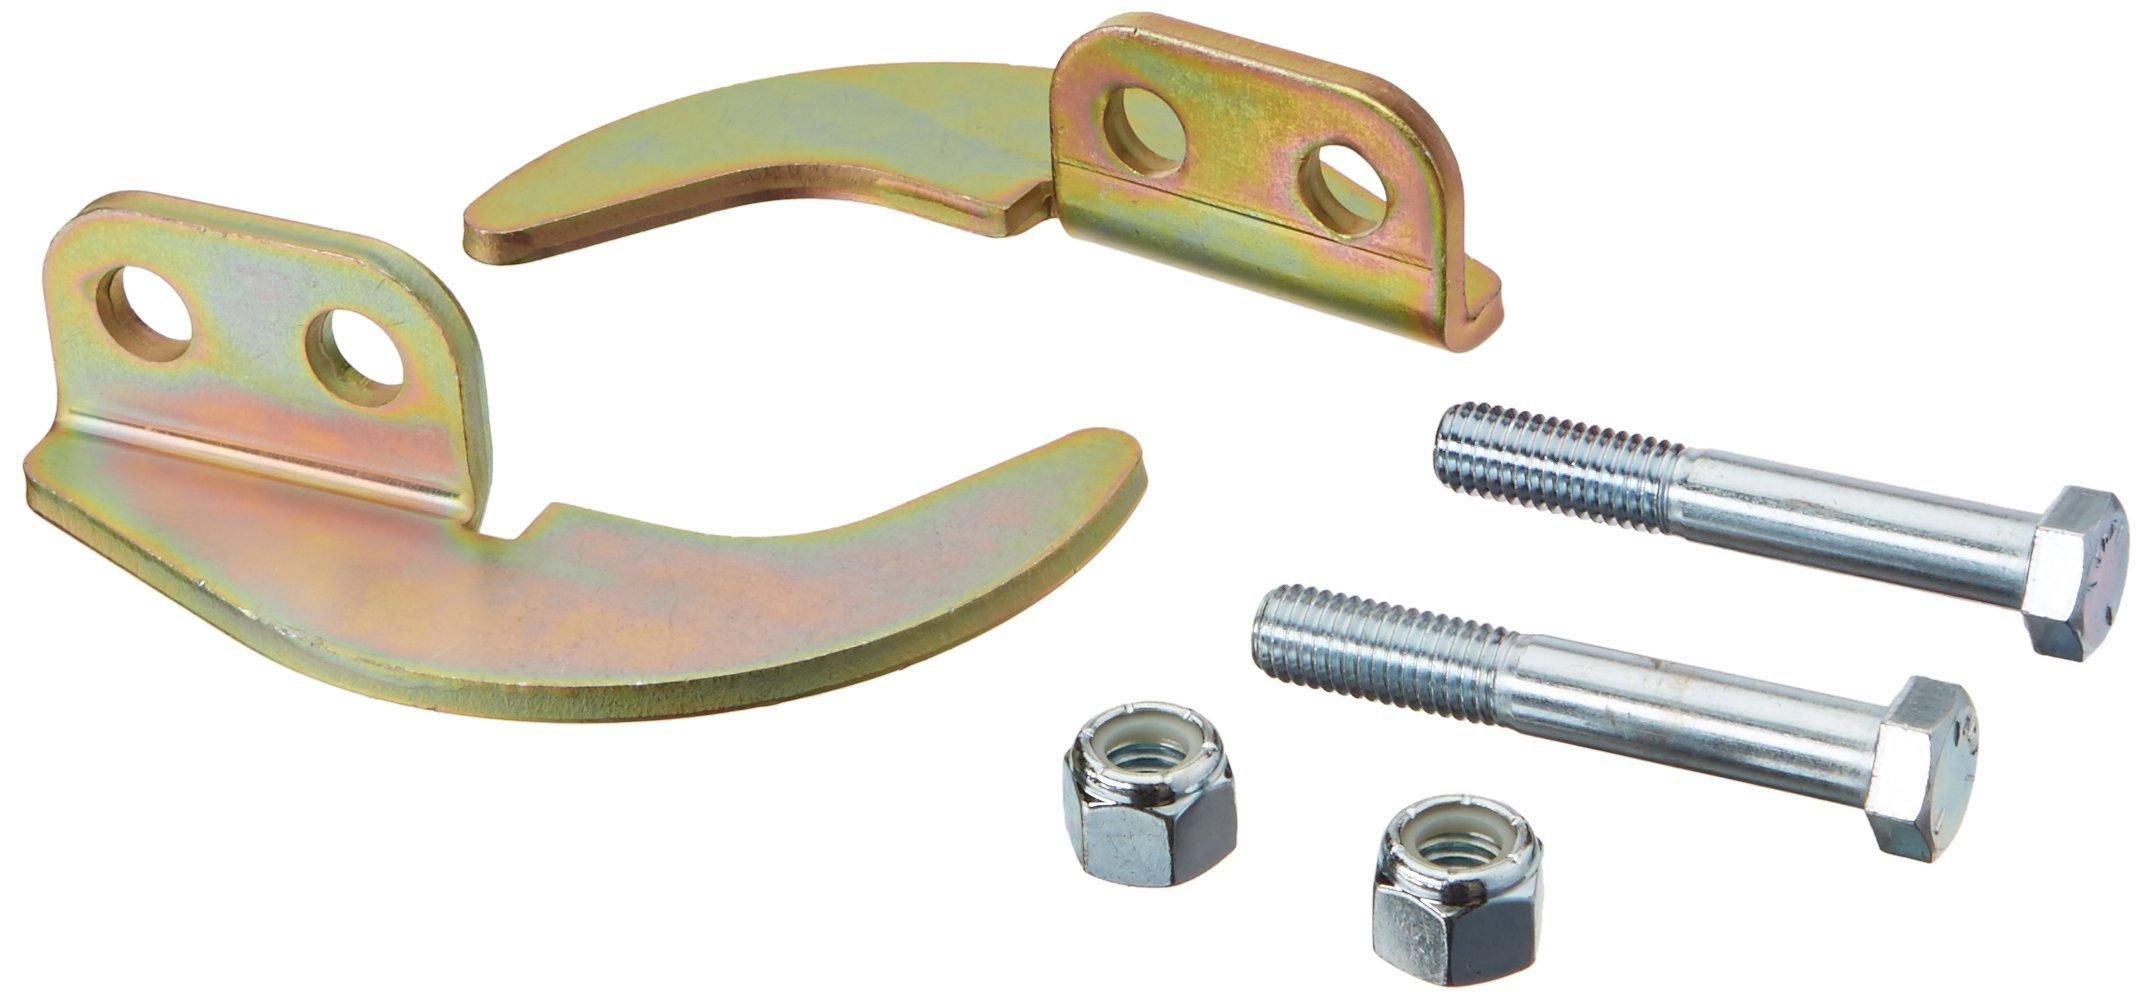 3M DBI-SALA SecuraSpan 7400008 Horizontal Lifeline Component, InterMediumiate Bypass Bracket Fit for I-Beam Stanchion, Zinc Plated Steel